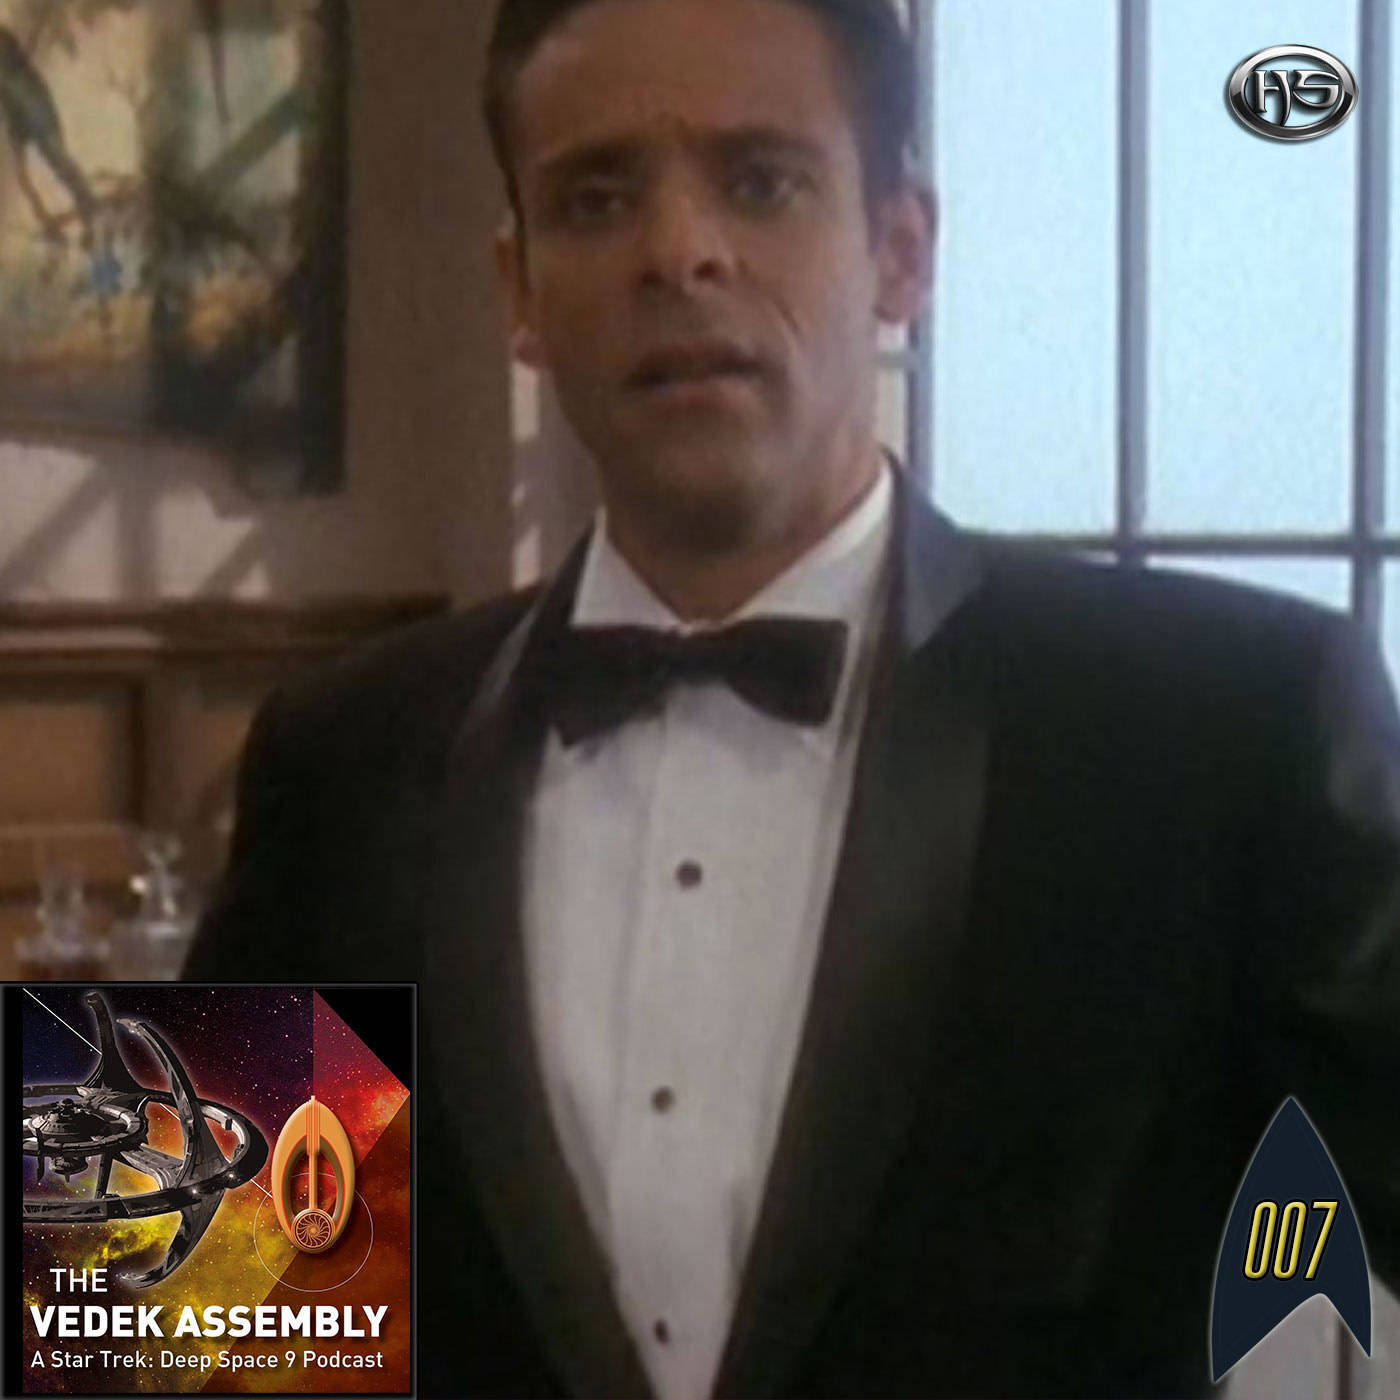 The Vedek Assembly Episode 7